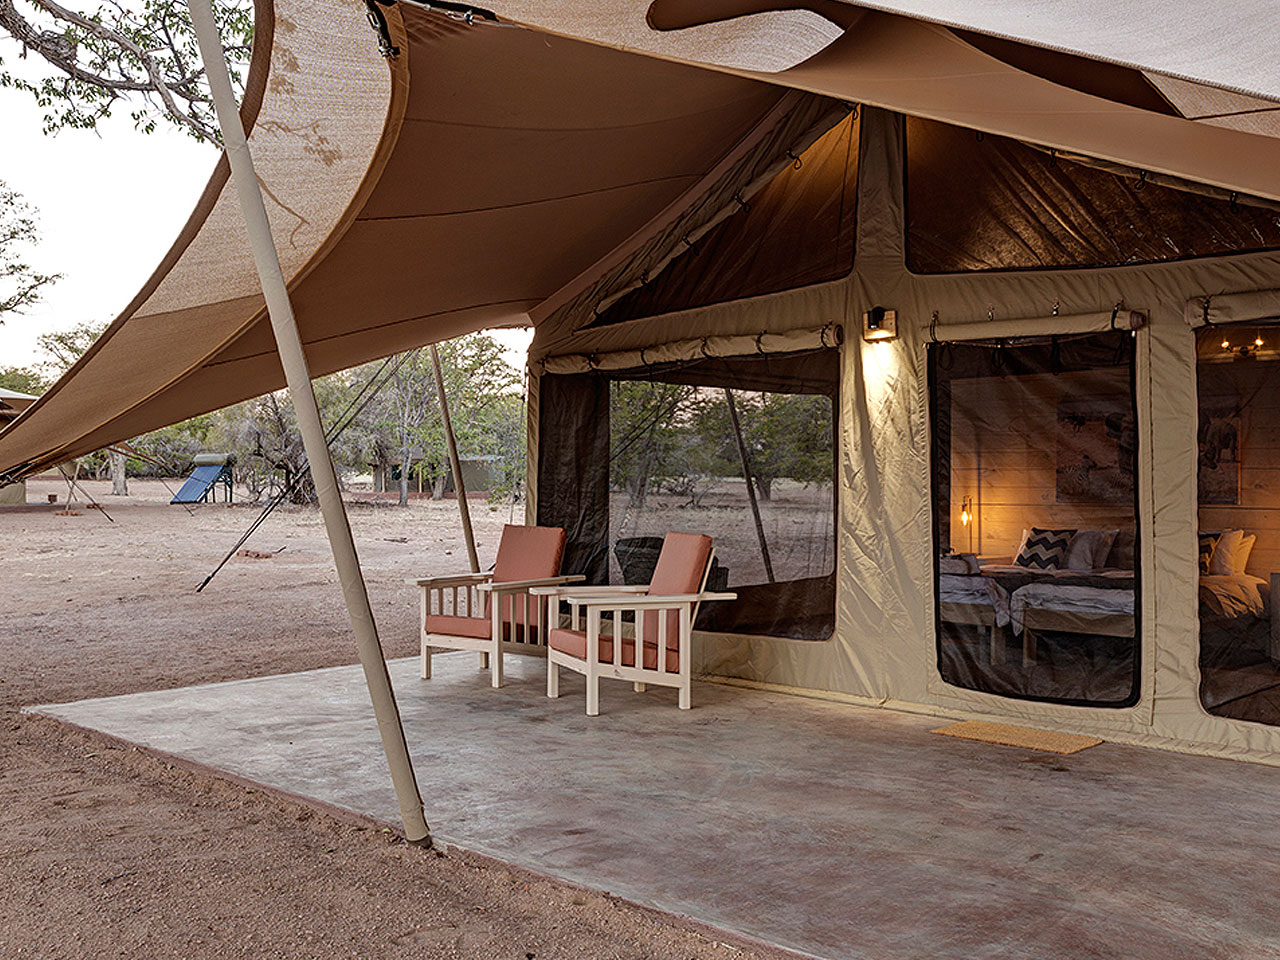 Malansrus Tented Camp